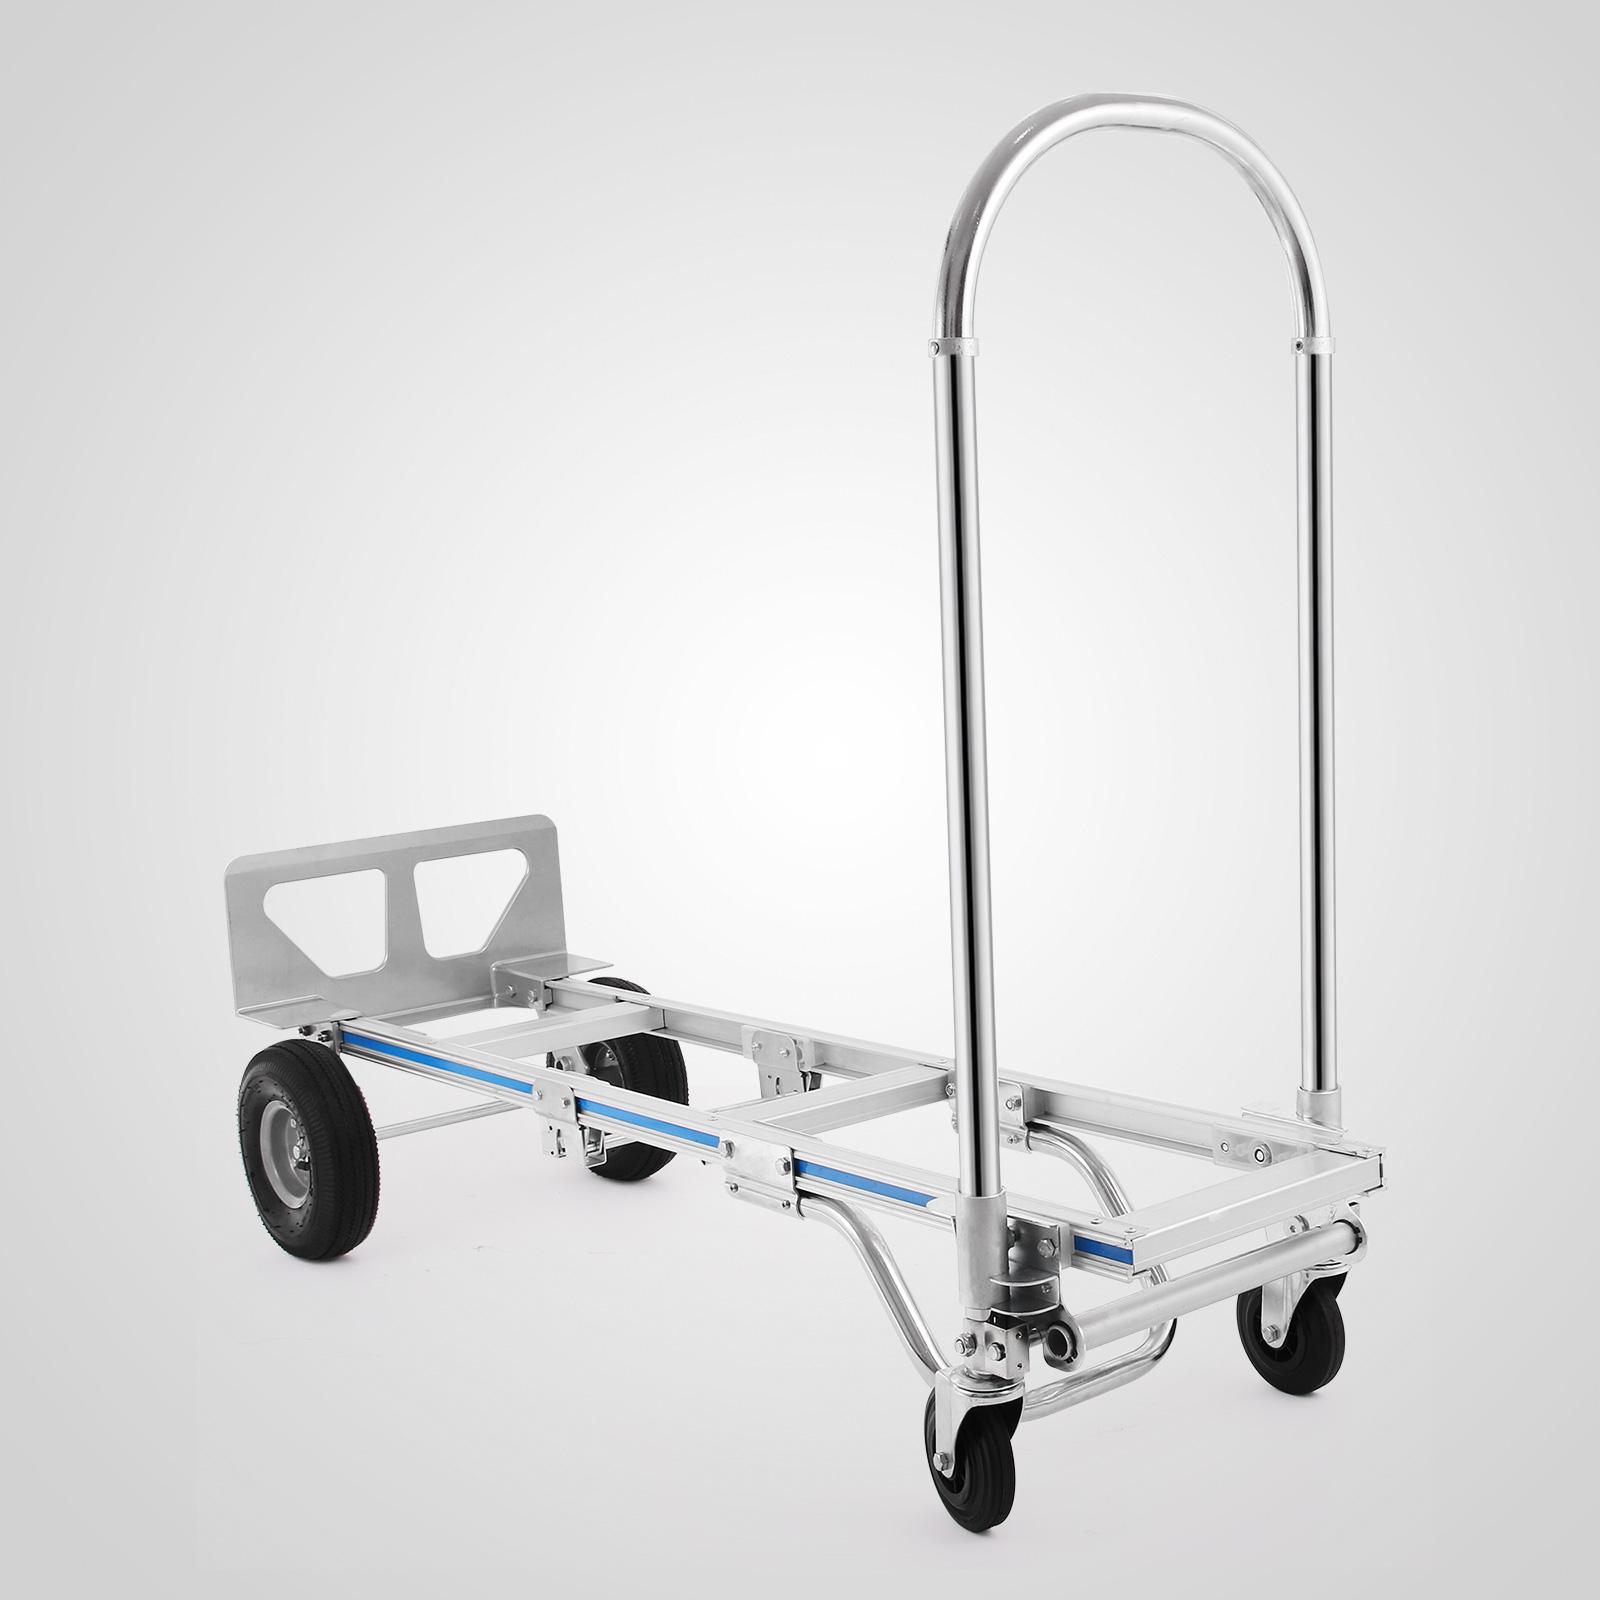 2 in 1 alu - sackkarre, stapelkarre 400 kg tragkraft expresso | ebay